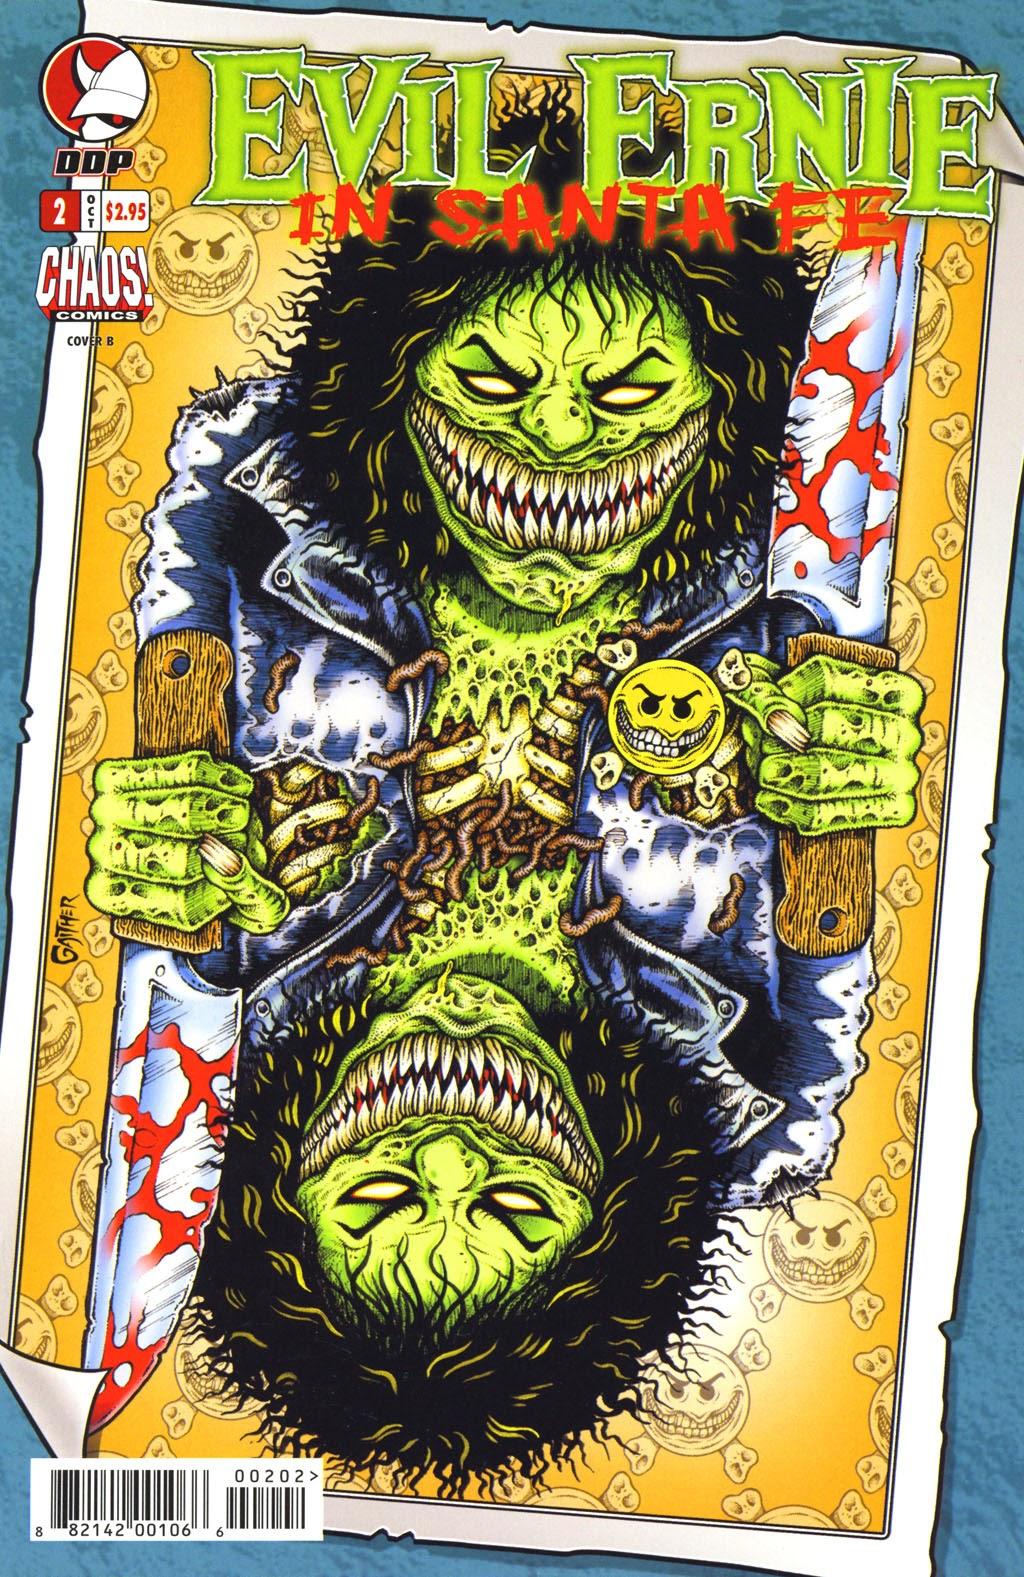 Read online Evil Ernie in Santa Fe comic -  Issue #2 - 2